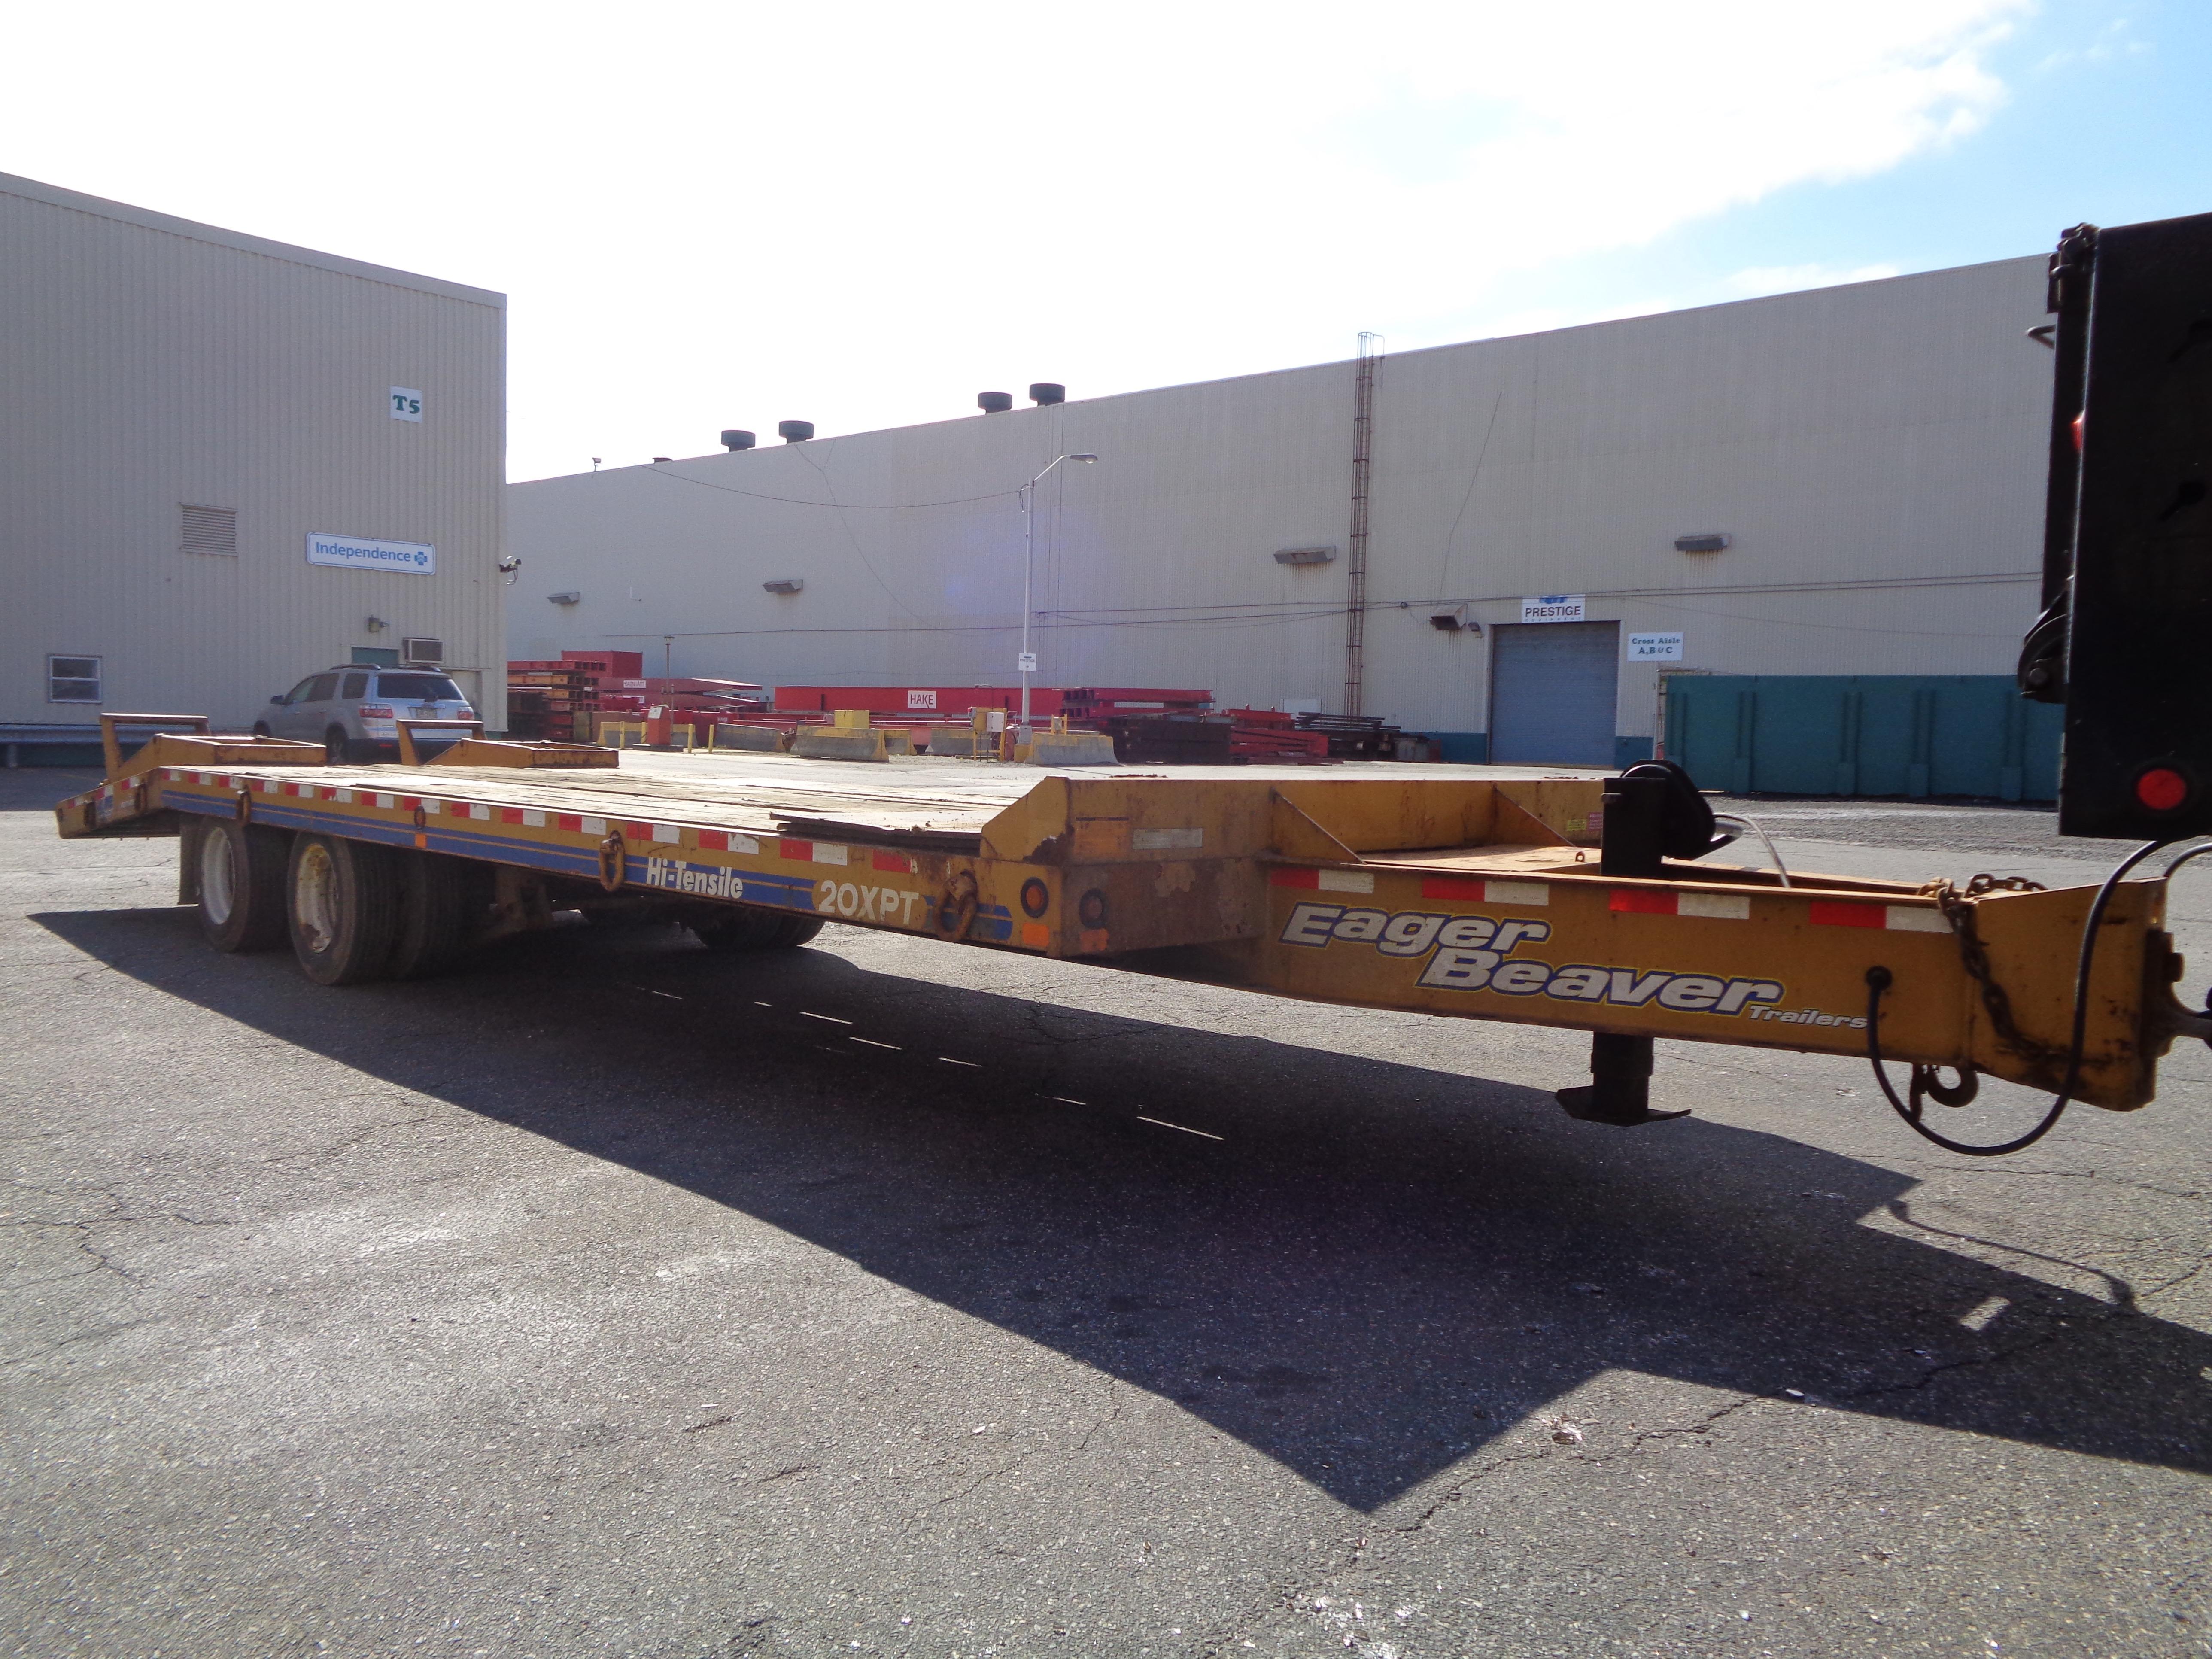 Lot 119 - 2011 Eager Beaver 20 Ton Tagalong Equipment Flatbed Trailer